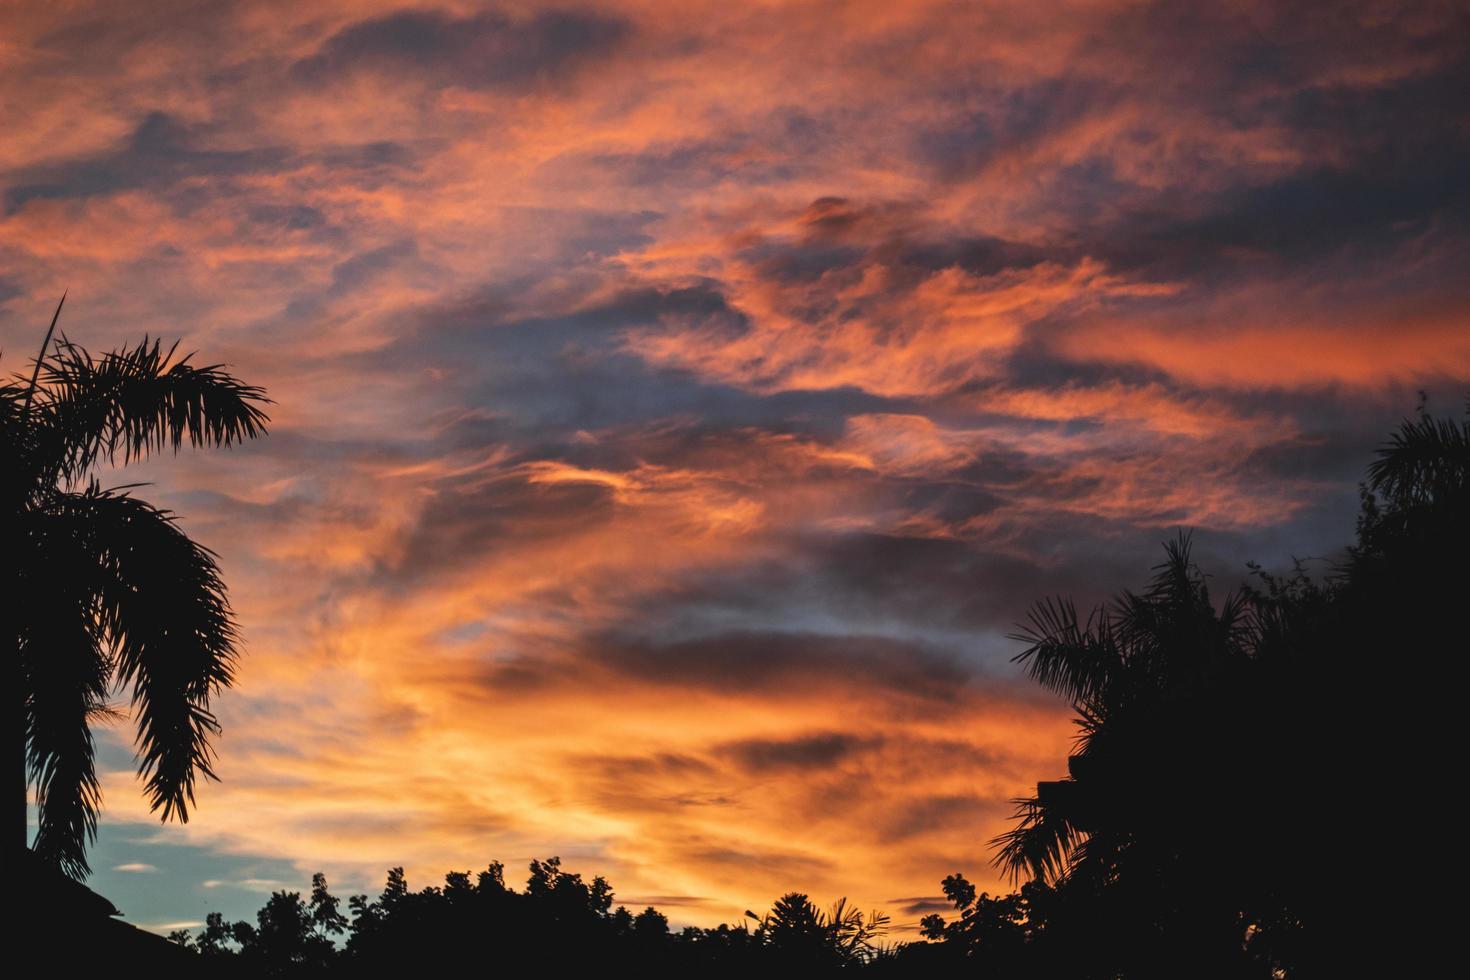 zonsondergang over palmbomen foto